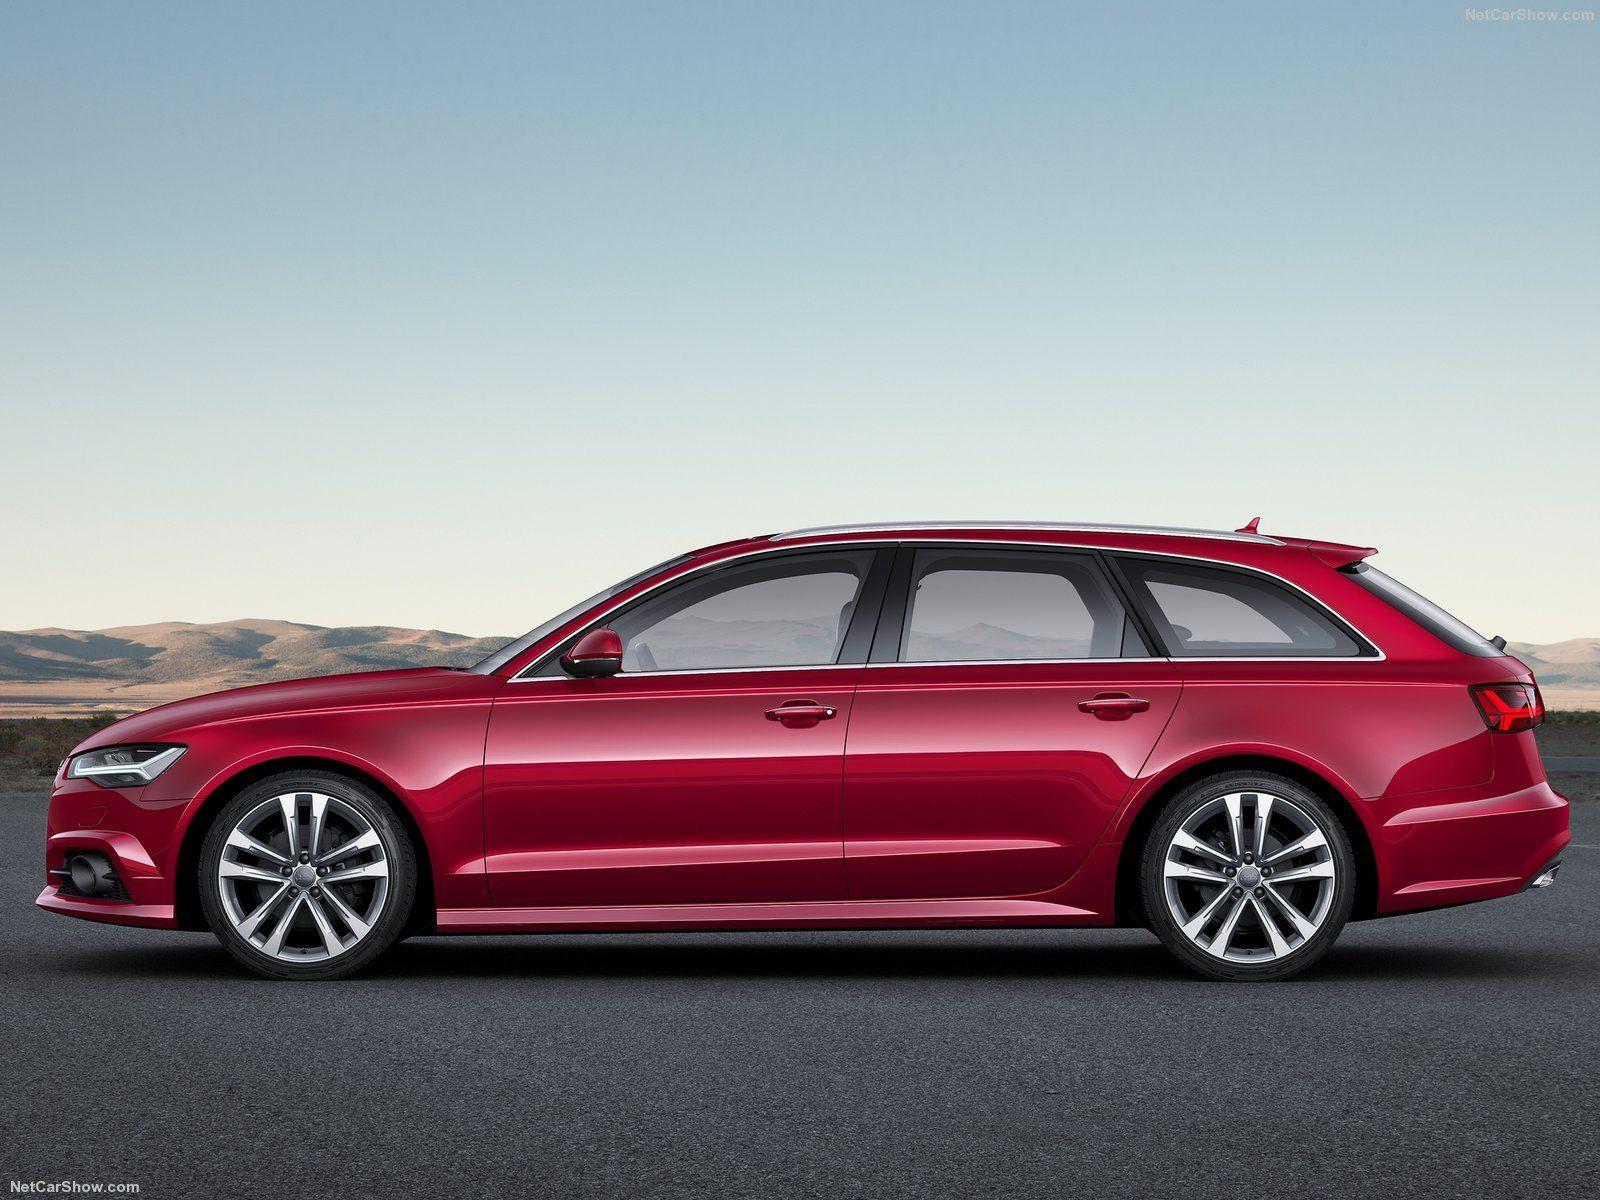 Audi A6 Avant 2017 Audi A6 Audi Audi A6 Avant